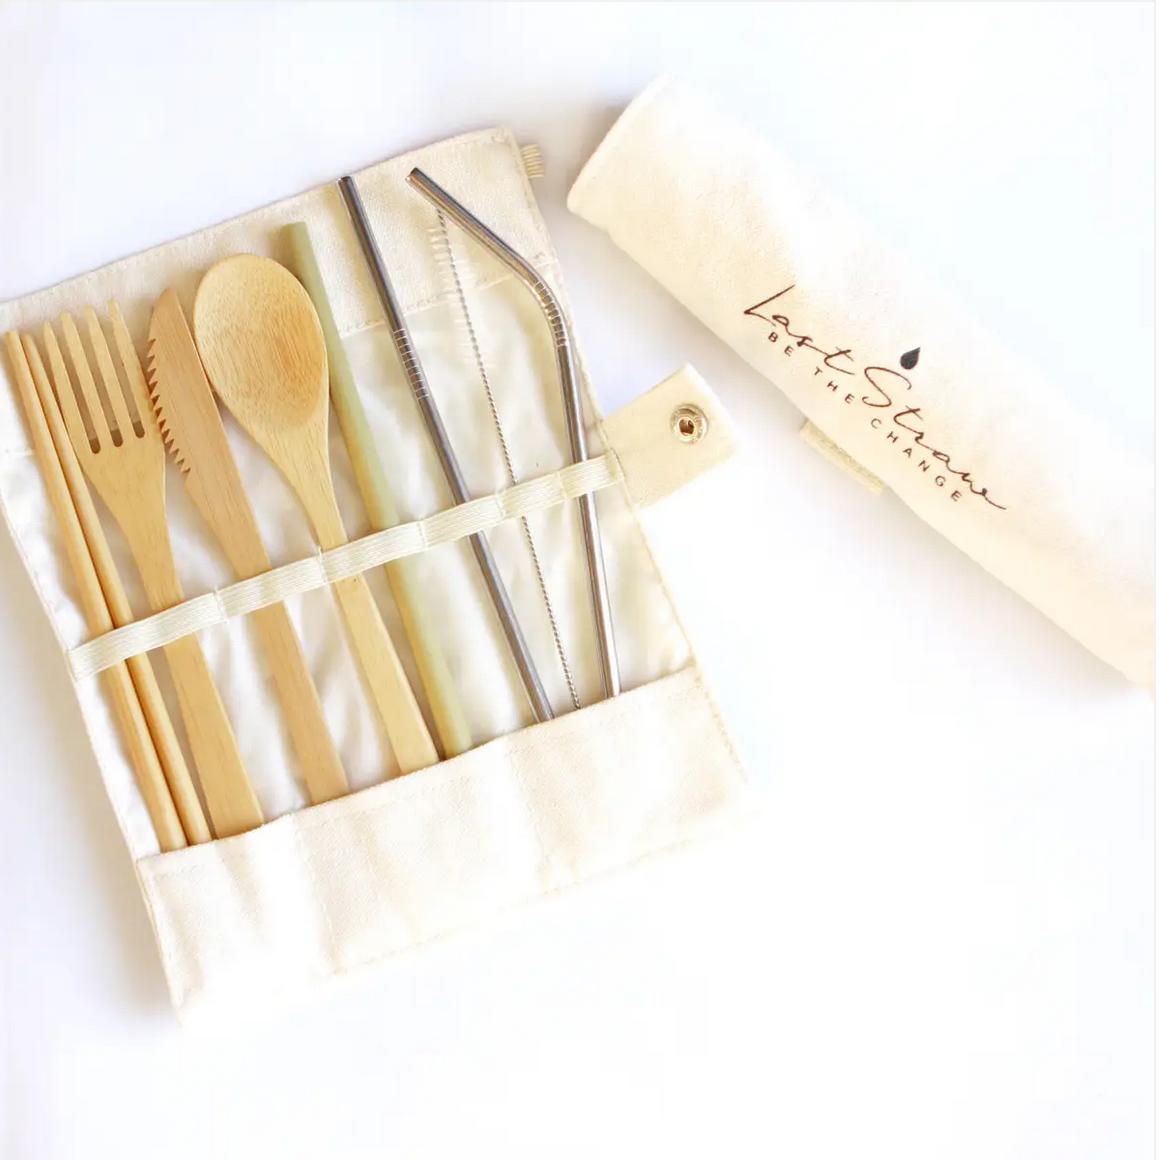 Last Straw Eco Bamboo/Stainless Utensil Straw Set